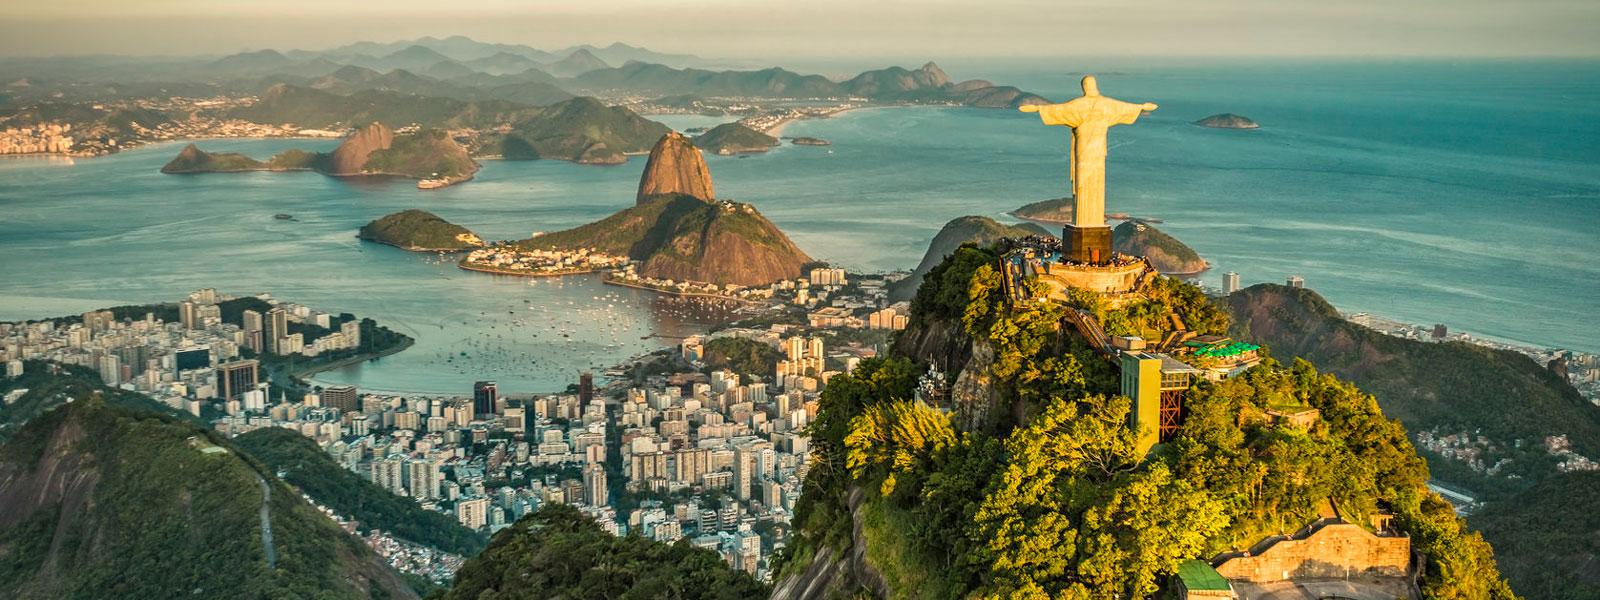 مهاجرت به برزیل